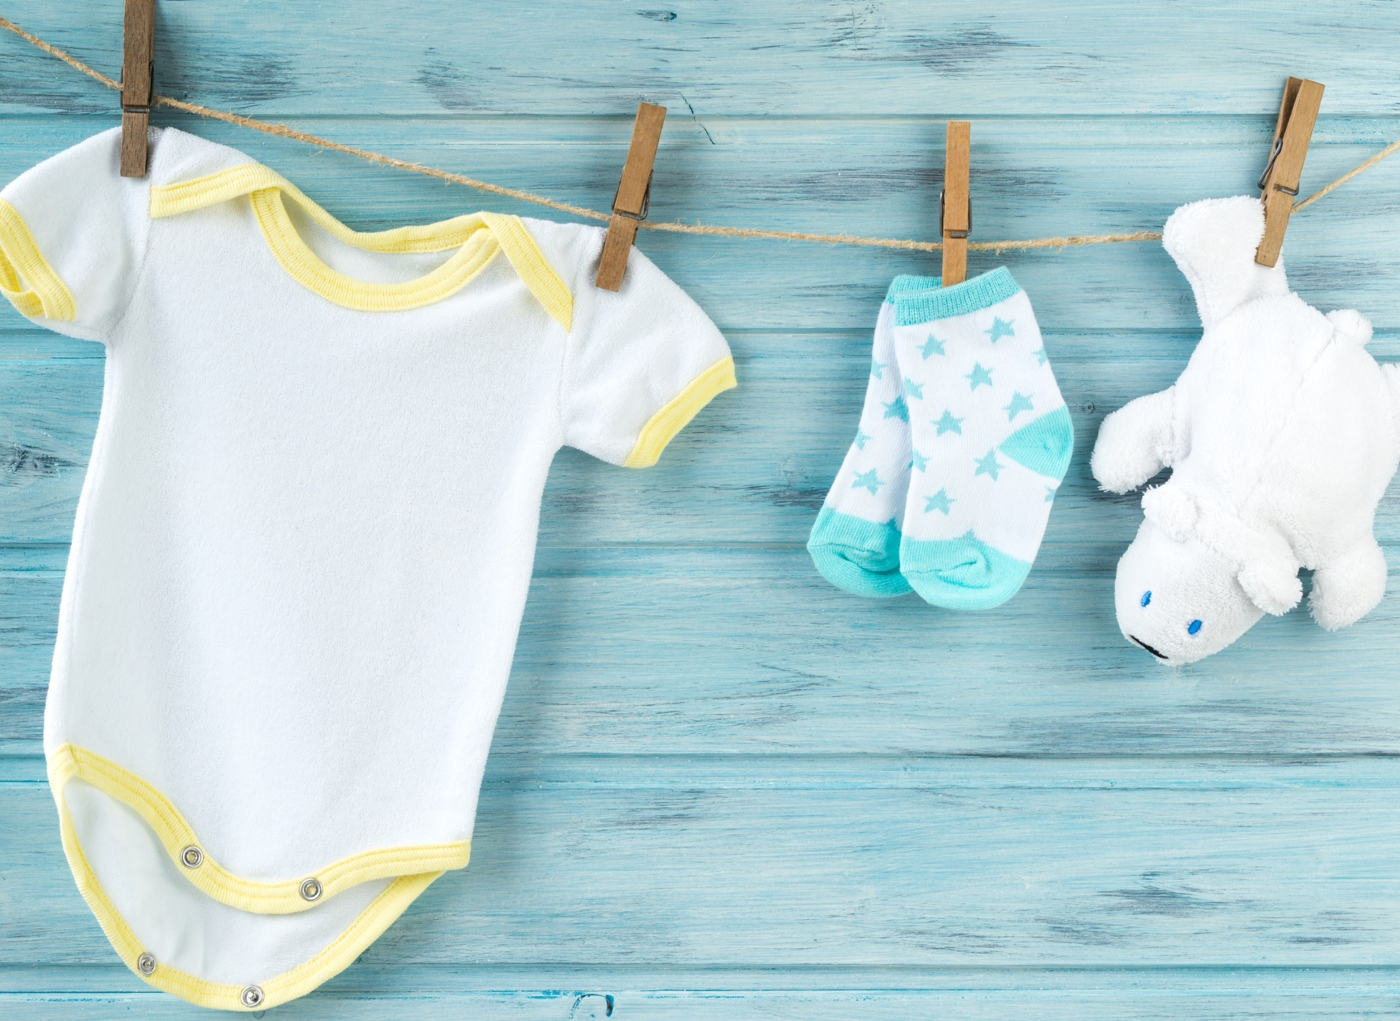 Onde comprar roupa de bebé barata: 12 sugestões